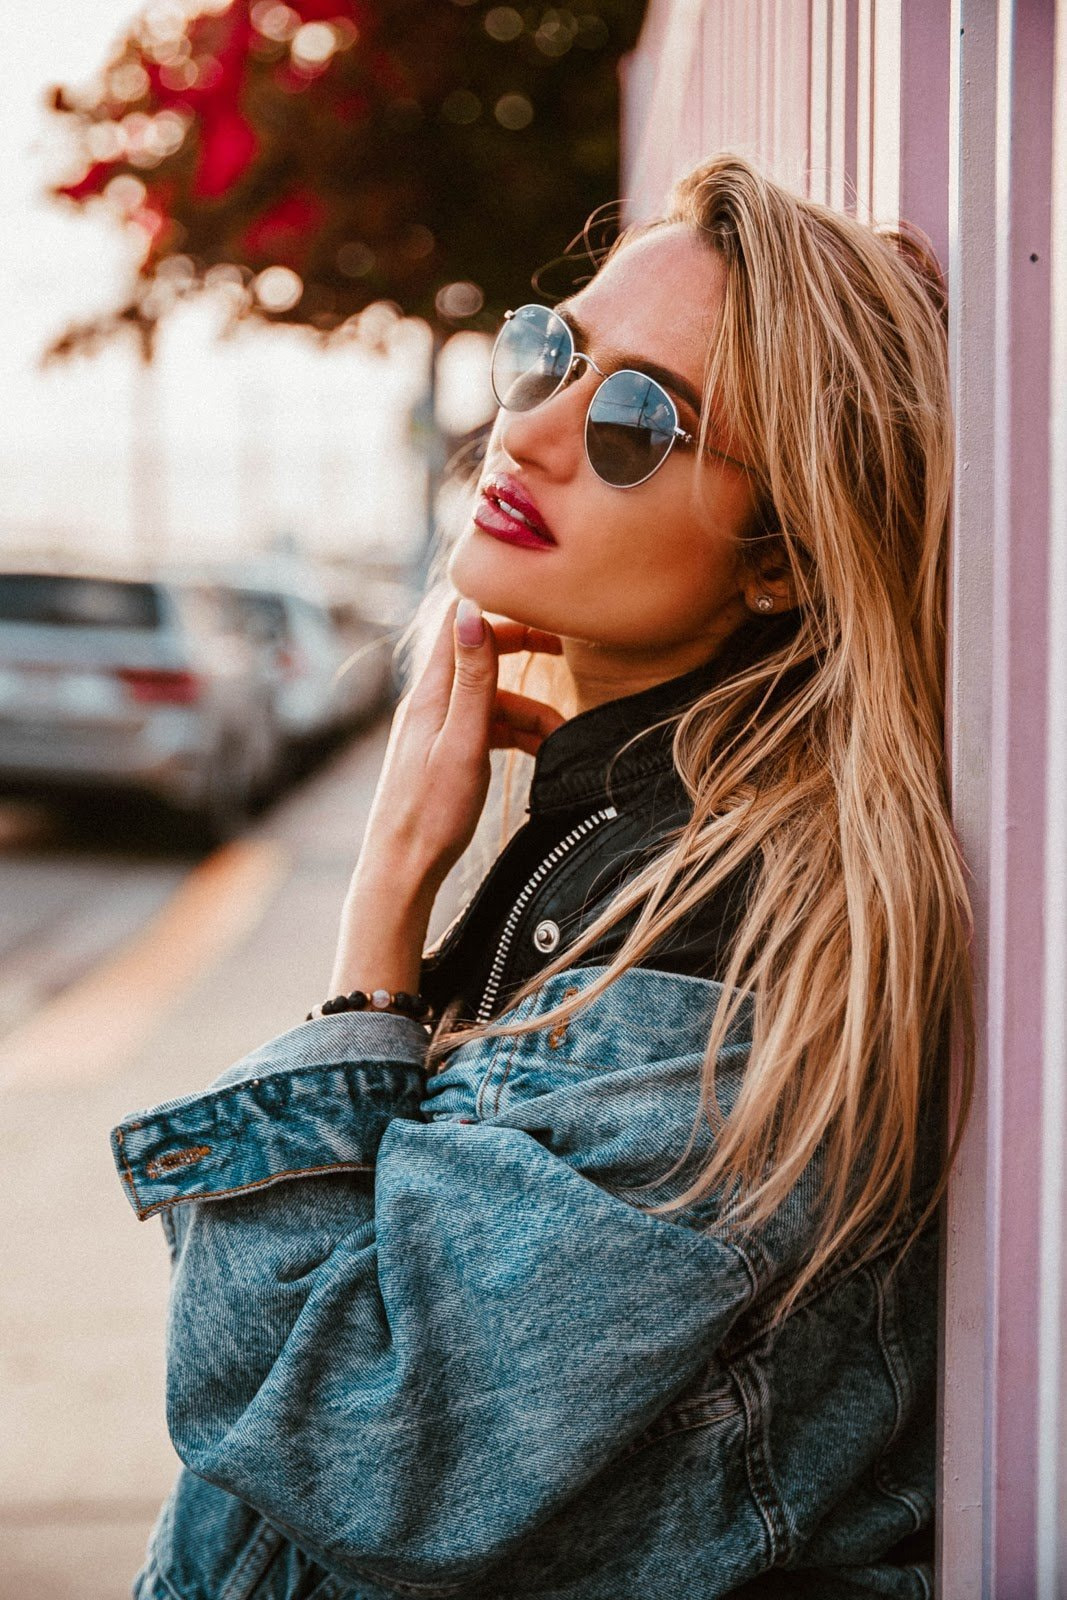 A blonde woman wearing sunglasses and a denim jacket by Frankie Cordobba